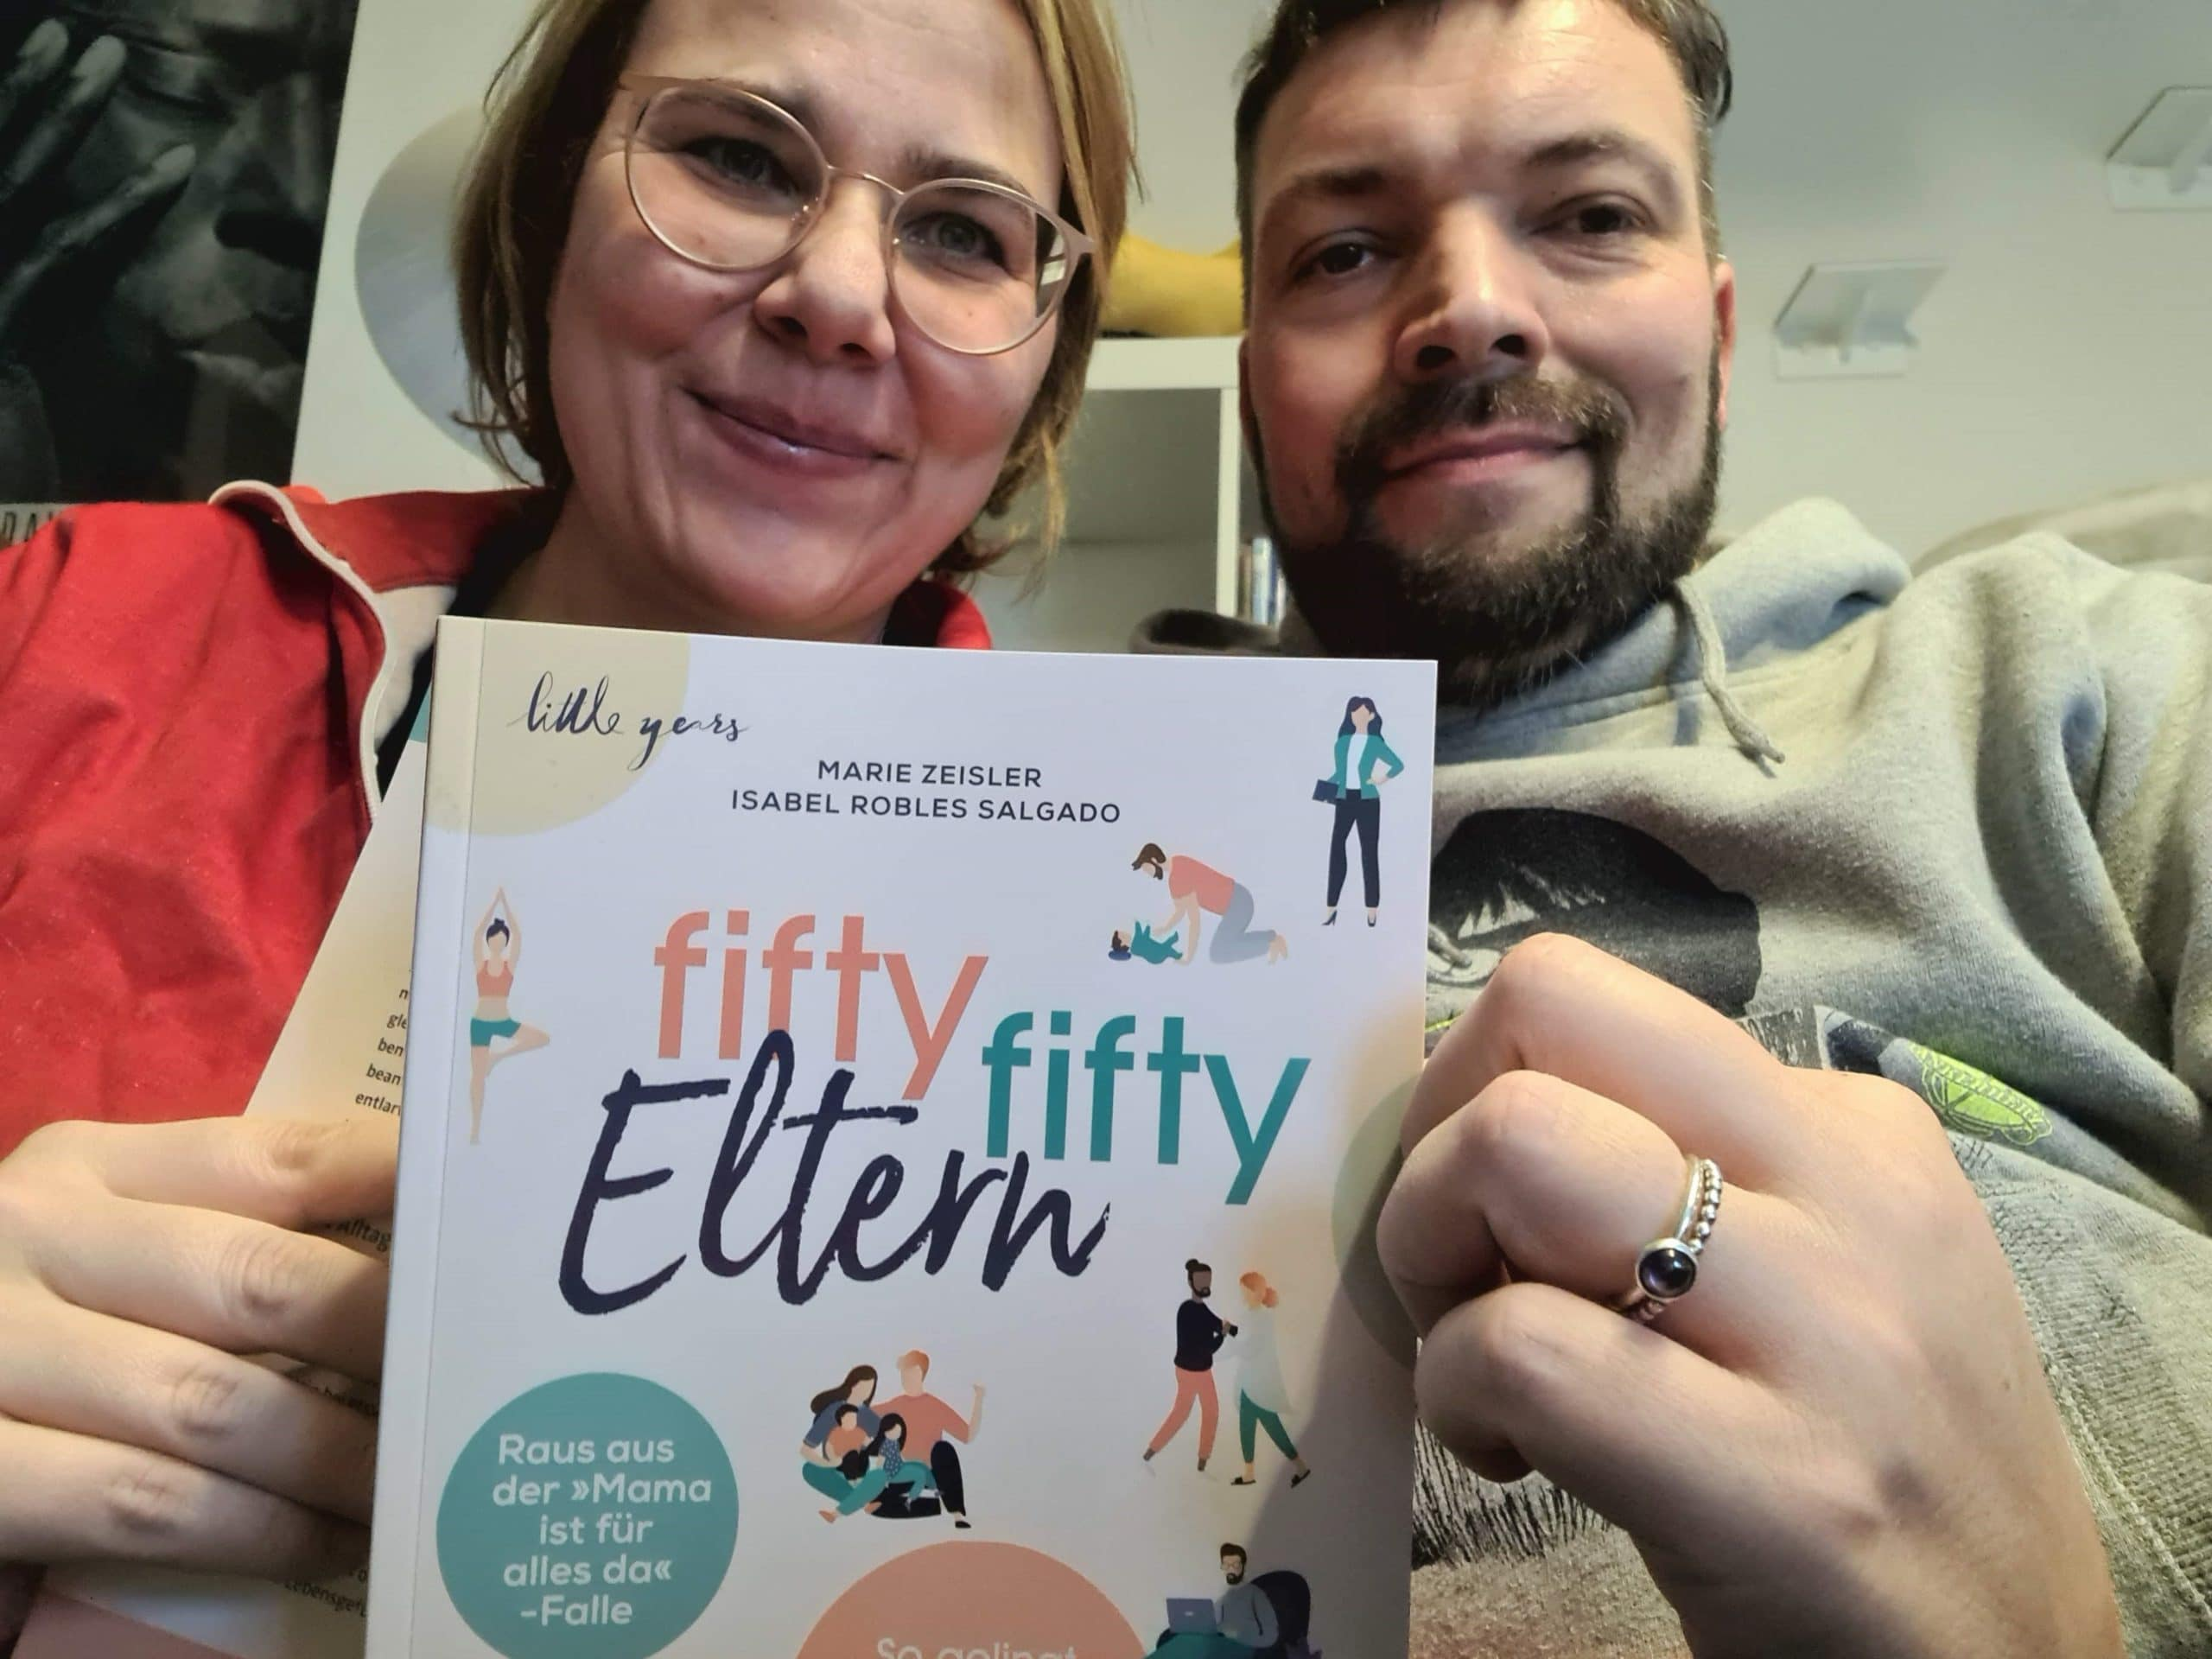 fifty Eltern fifty Eltern litteyearsblog